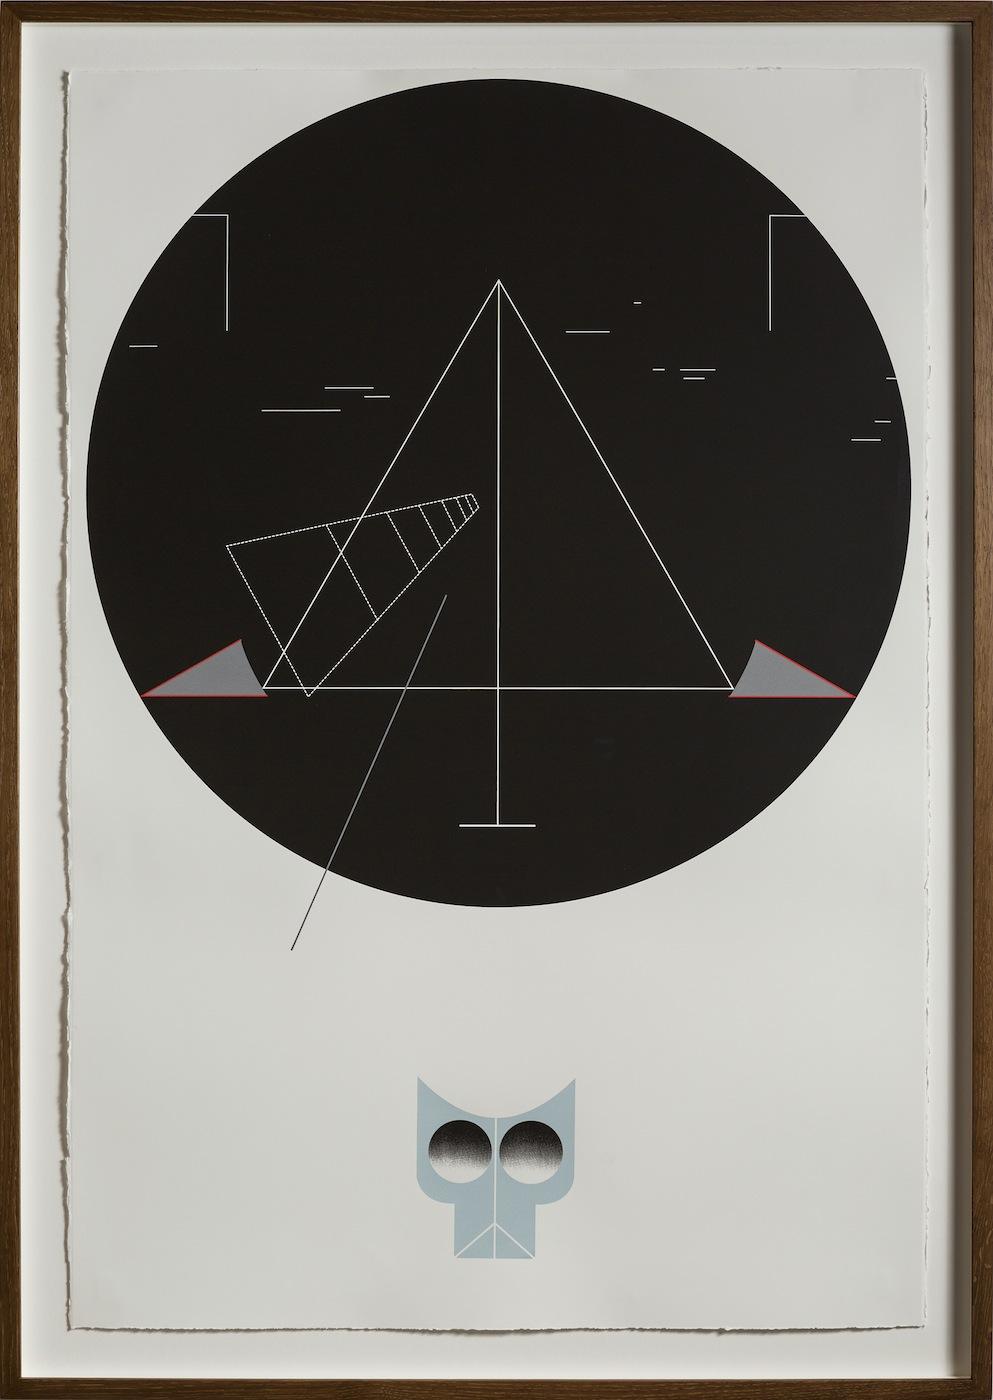 Night Walk 2013 Screen print on paper 112.5 x 76.5 cm Edition 5 + 1 AP